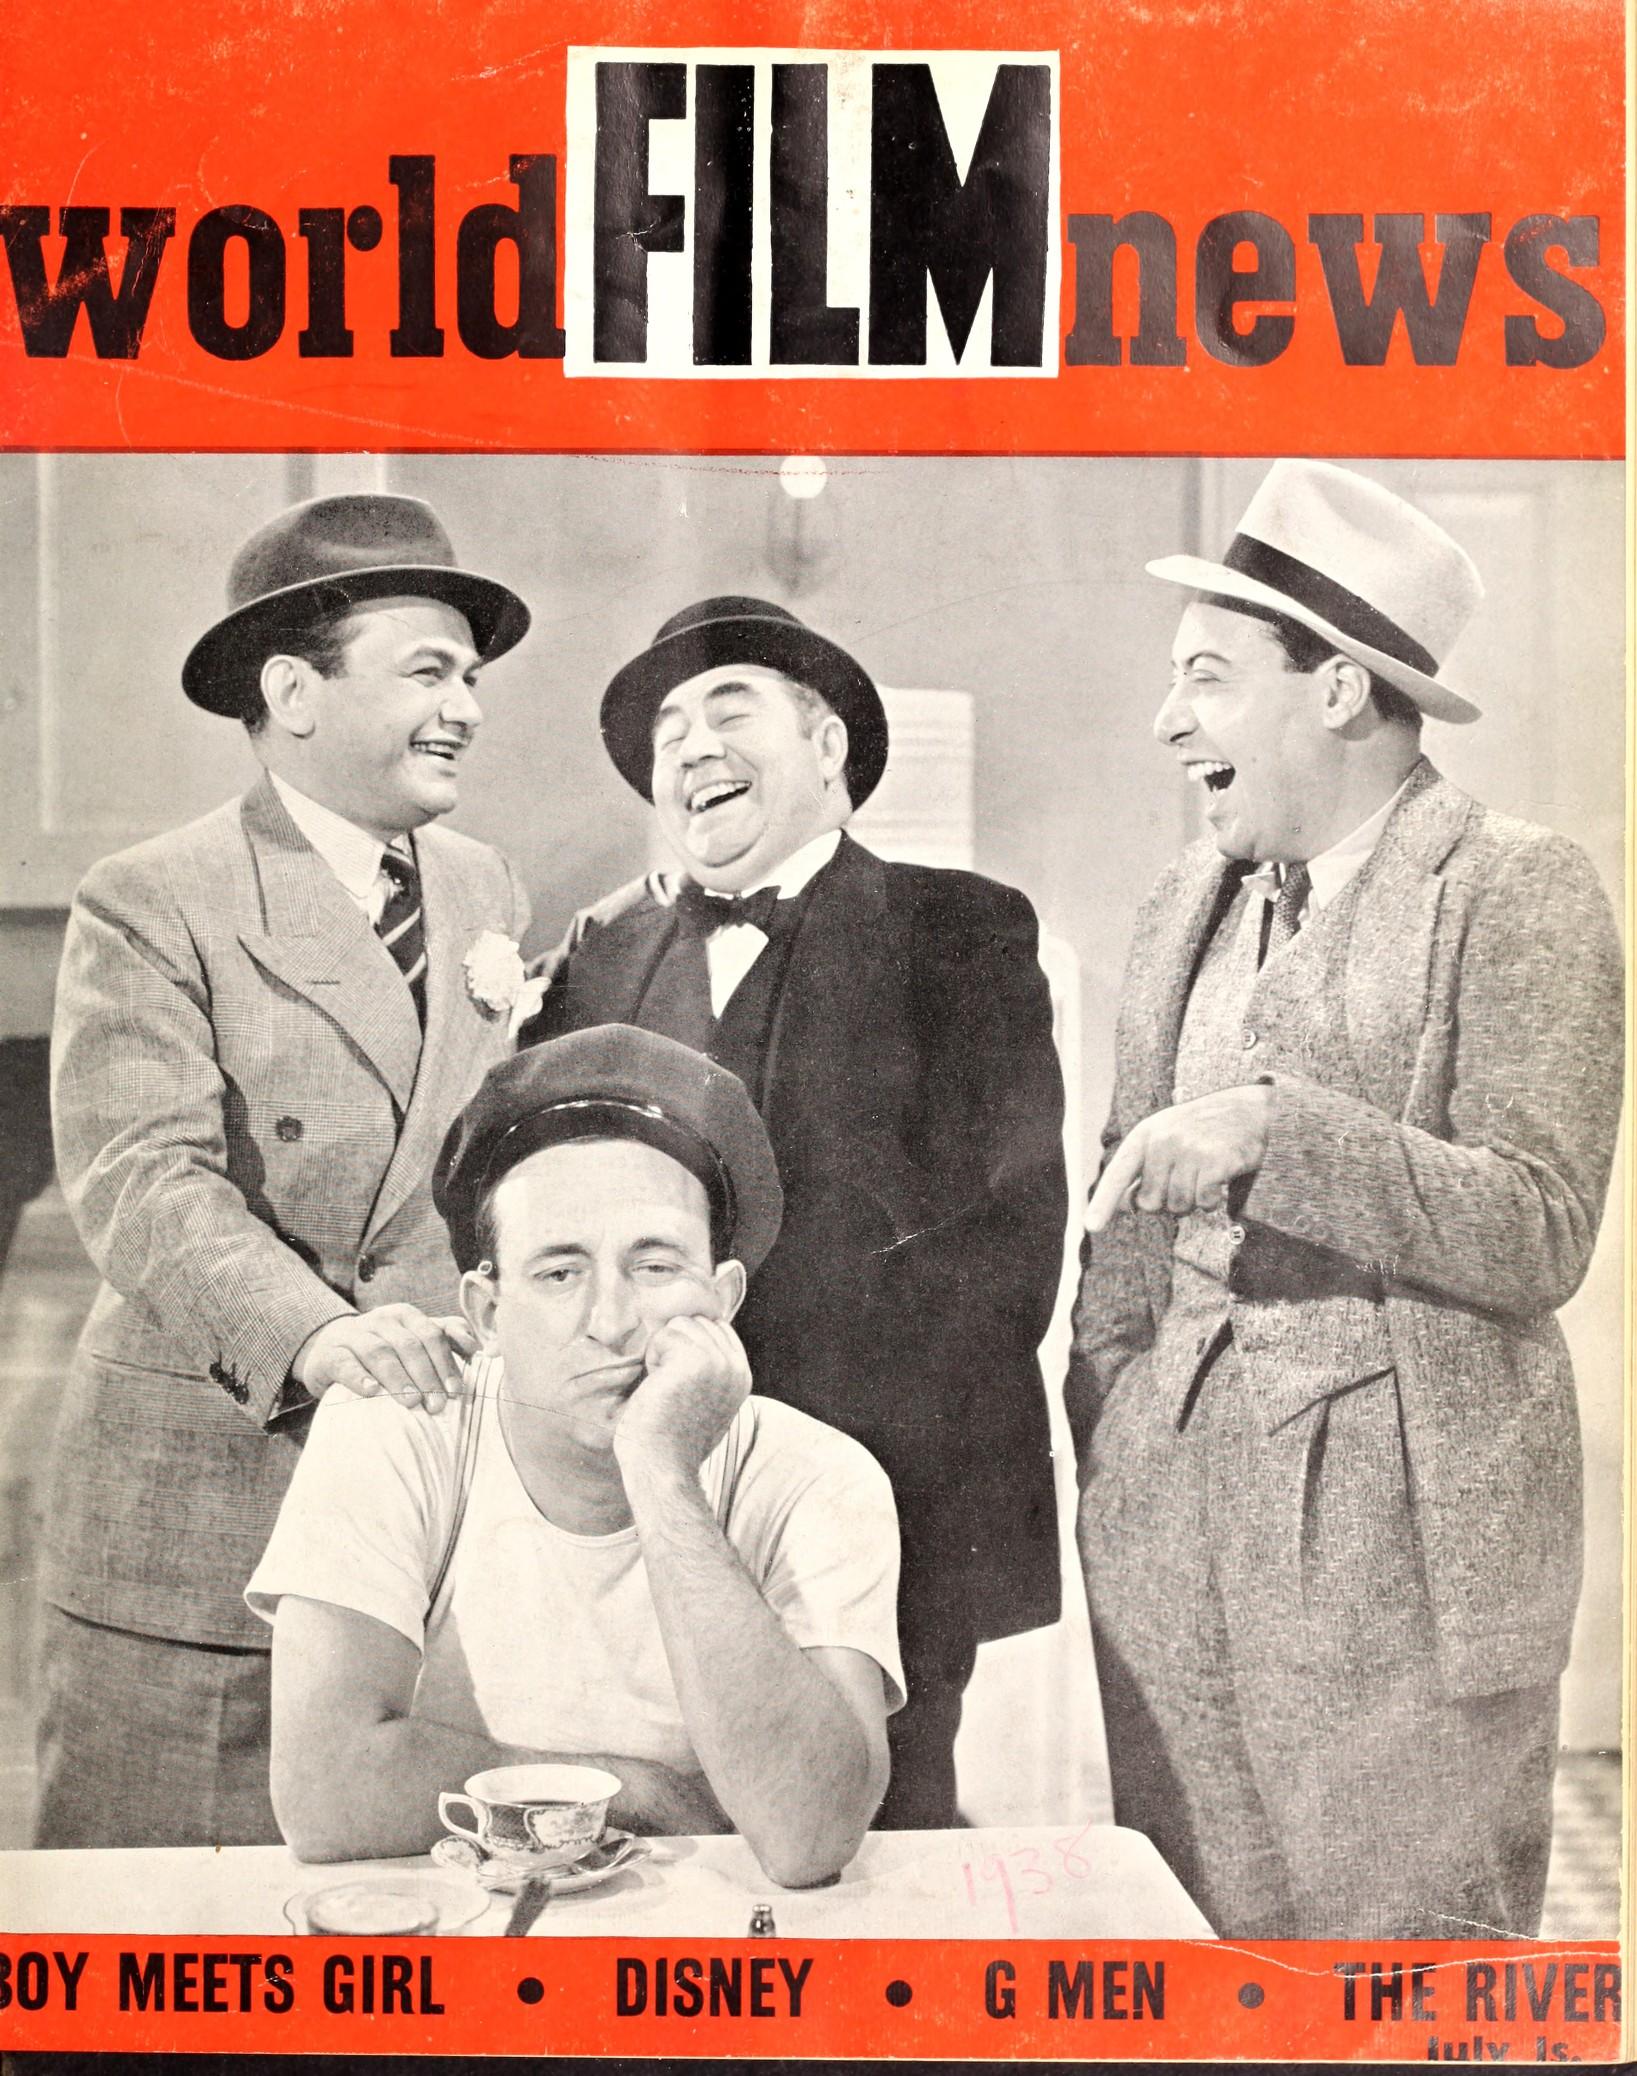 Worldfilm03cine_jp2.zip&file=worldfilm03cine_jp2%2fworldfilm03cine_0113